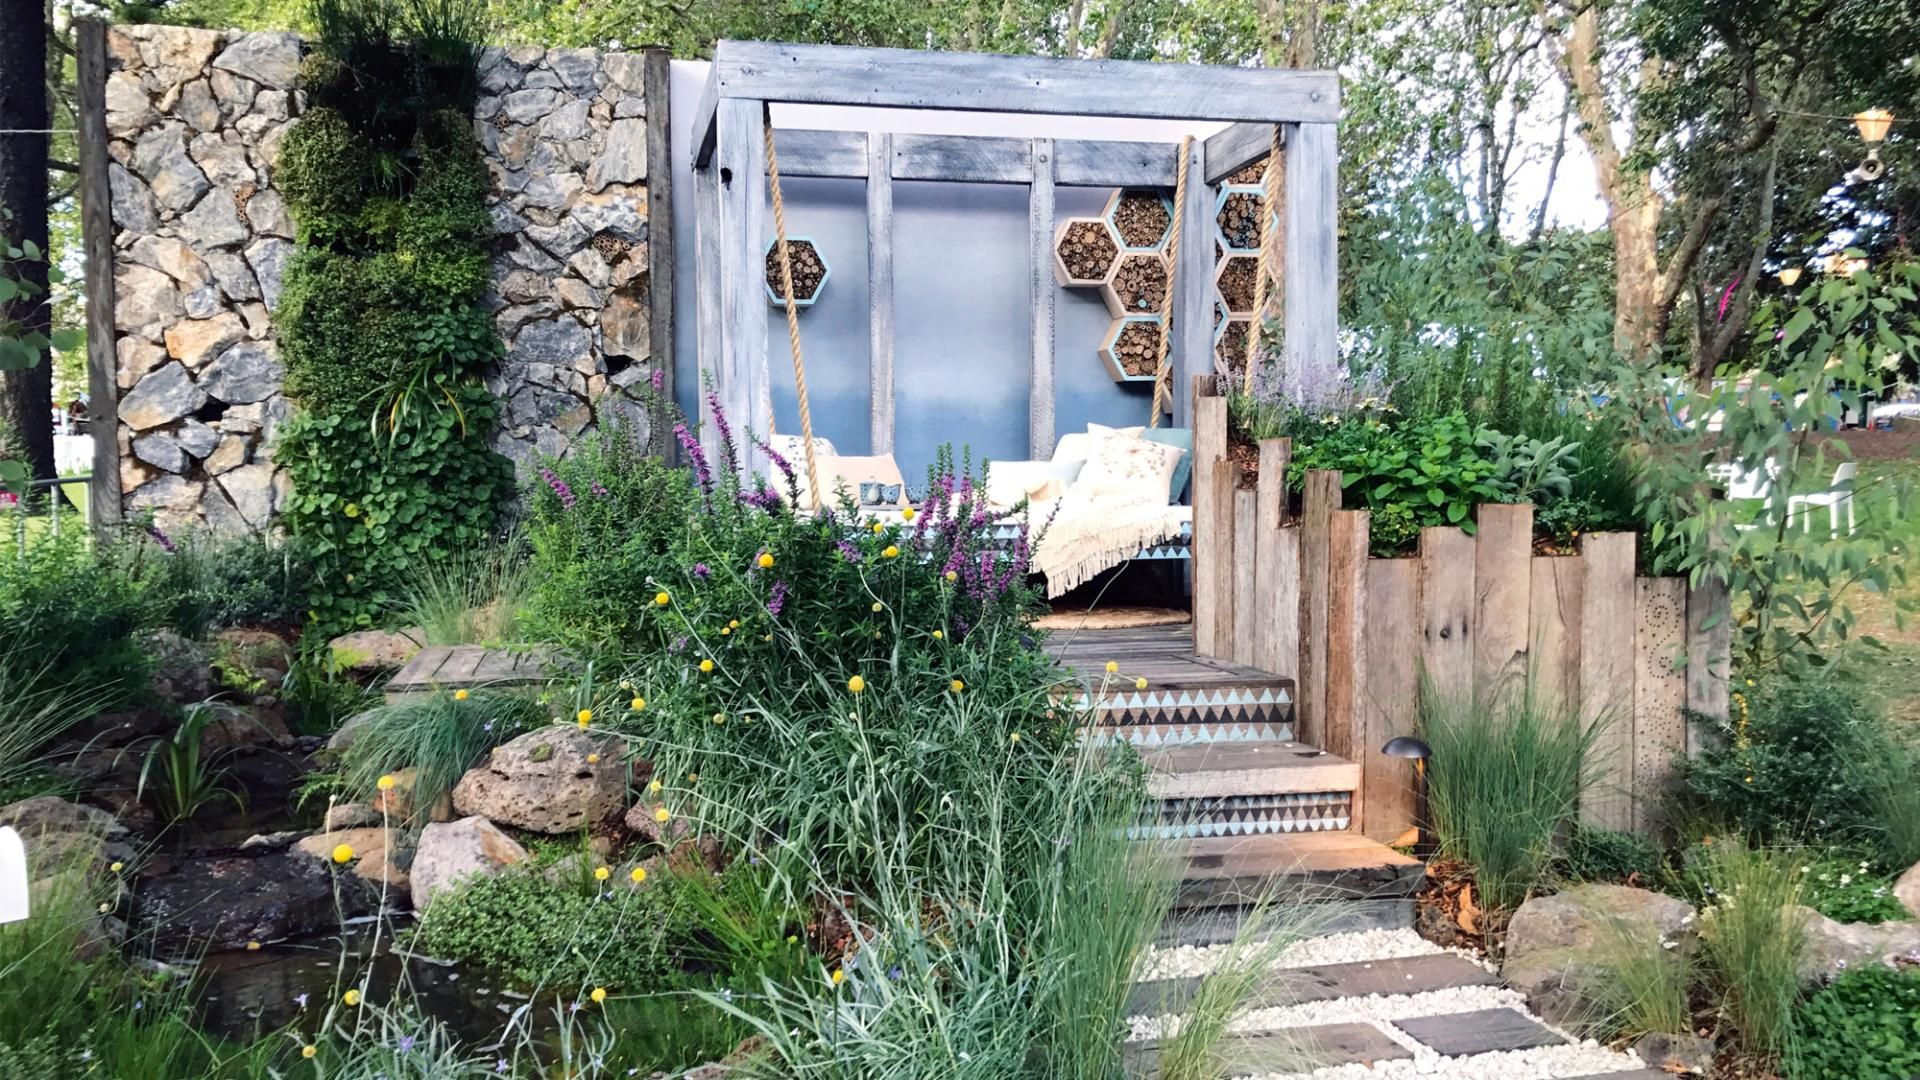 Best ideas from winner of the Melbourne Internationa Flower & Garden ...